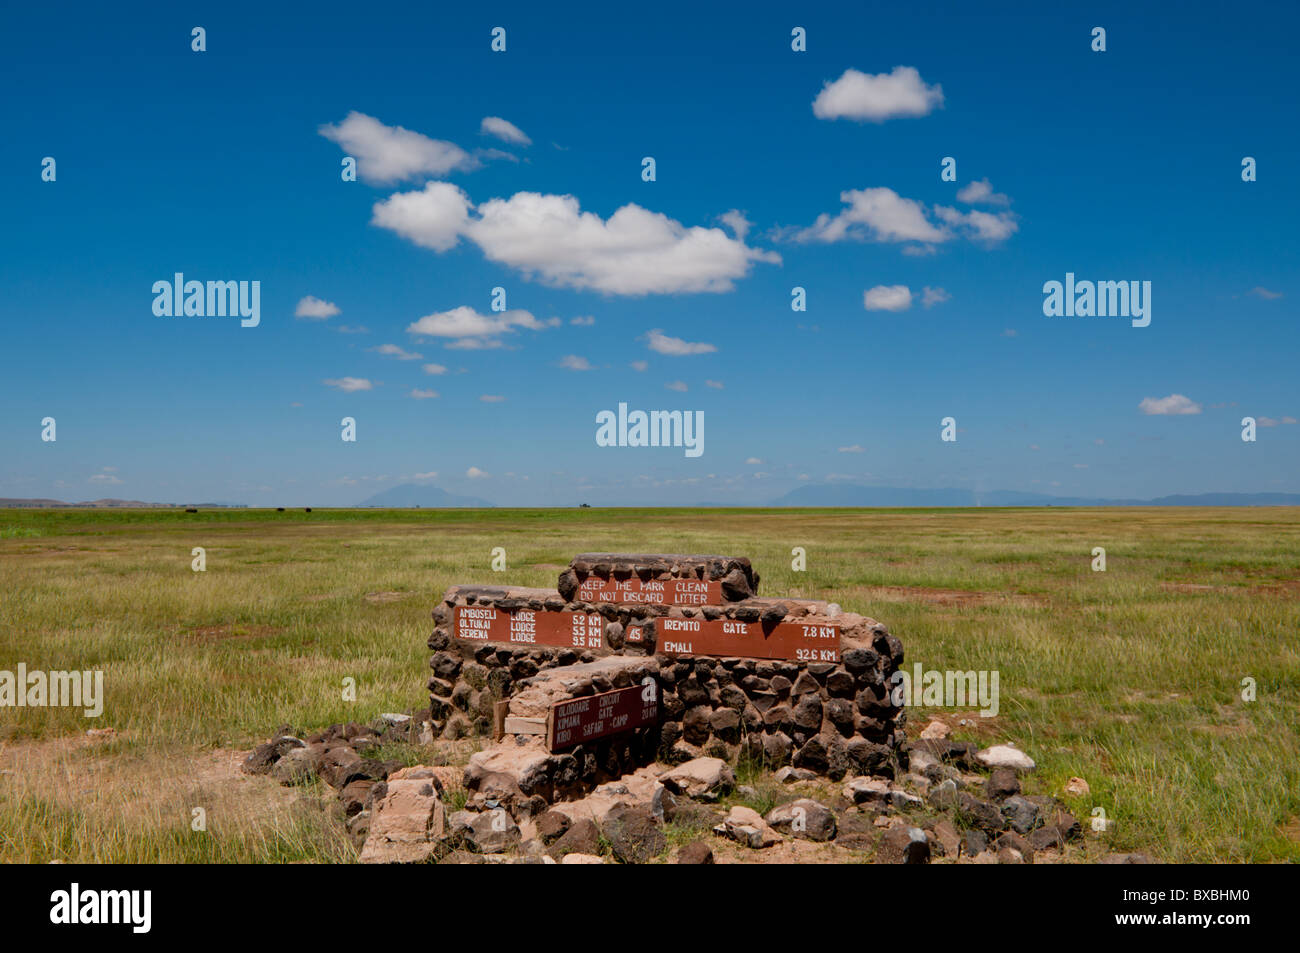 East Africa, Kenya, Amboseli, road junction direction marker - Stock Image